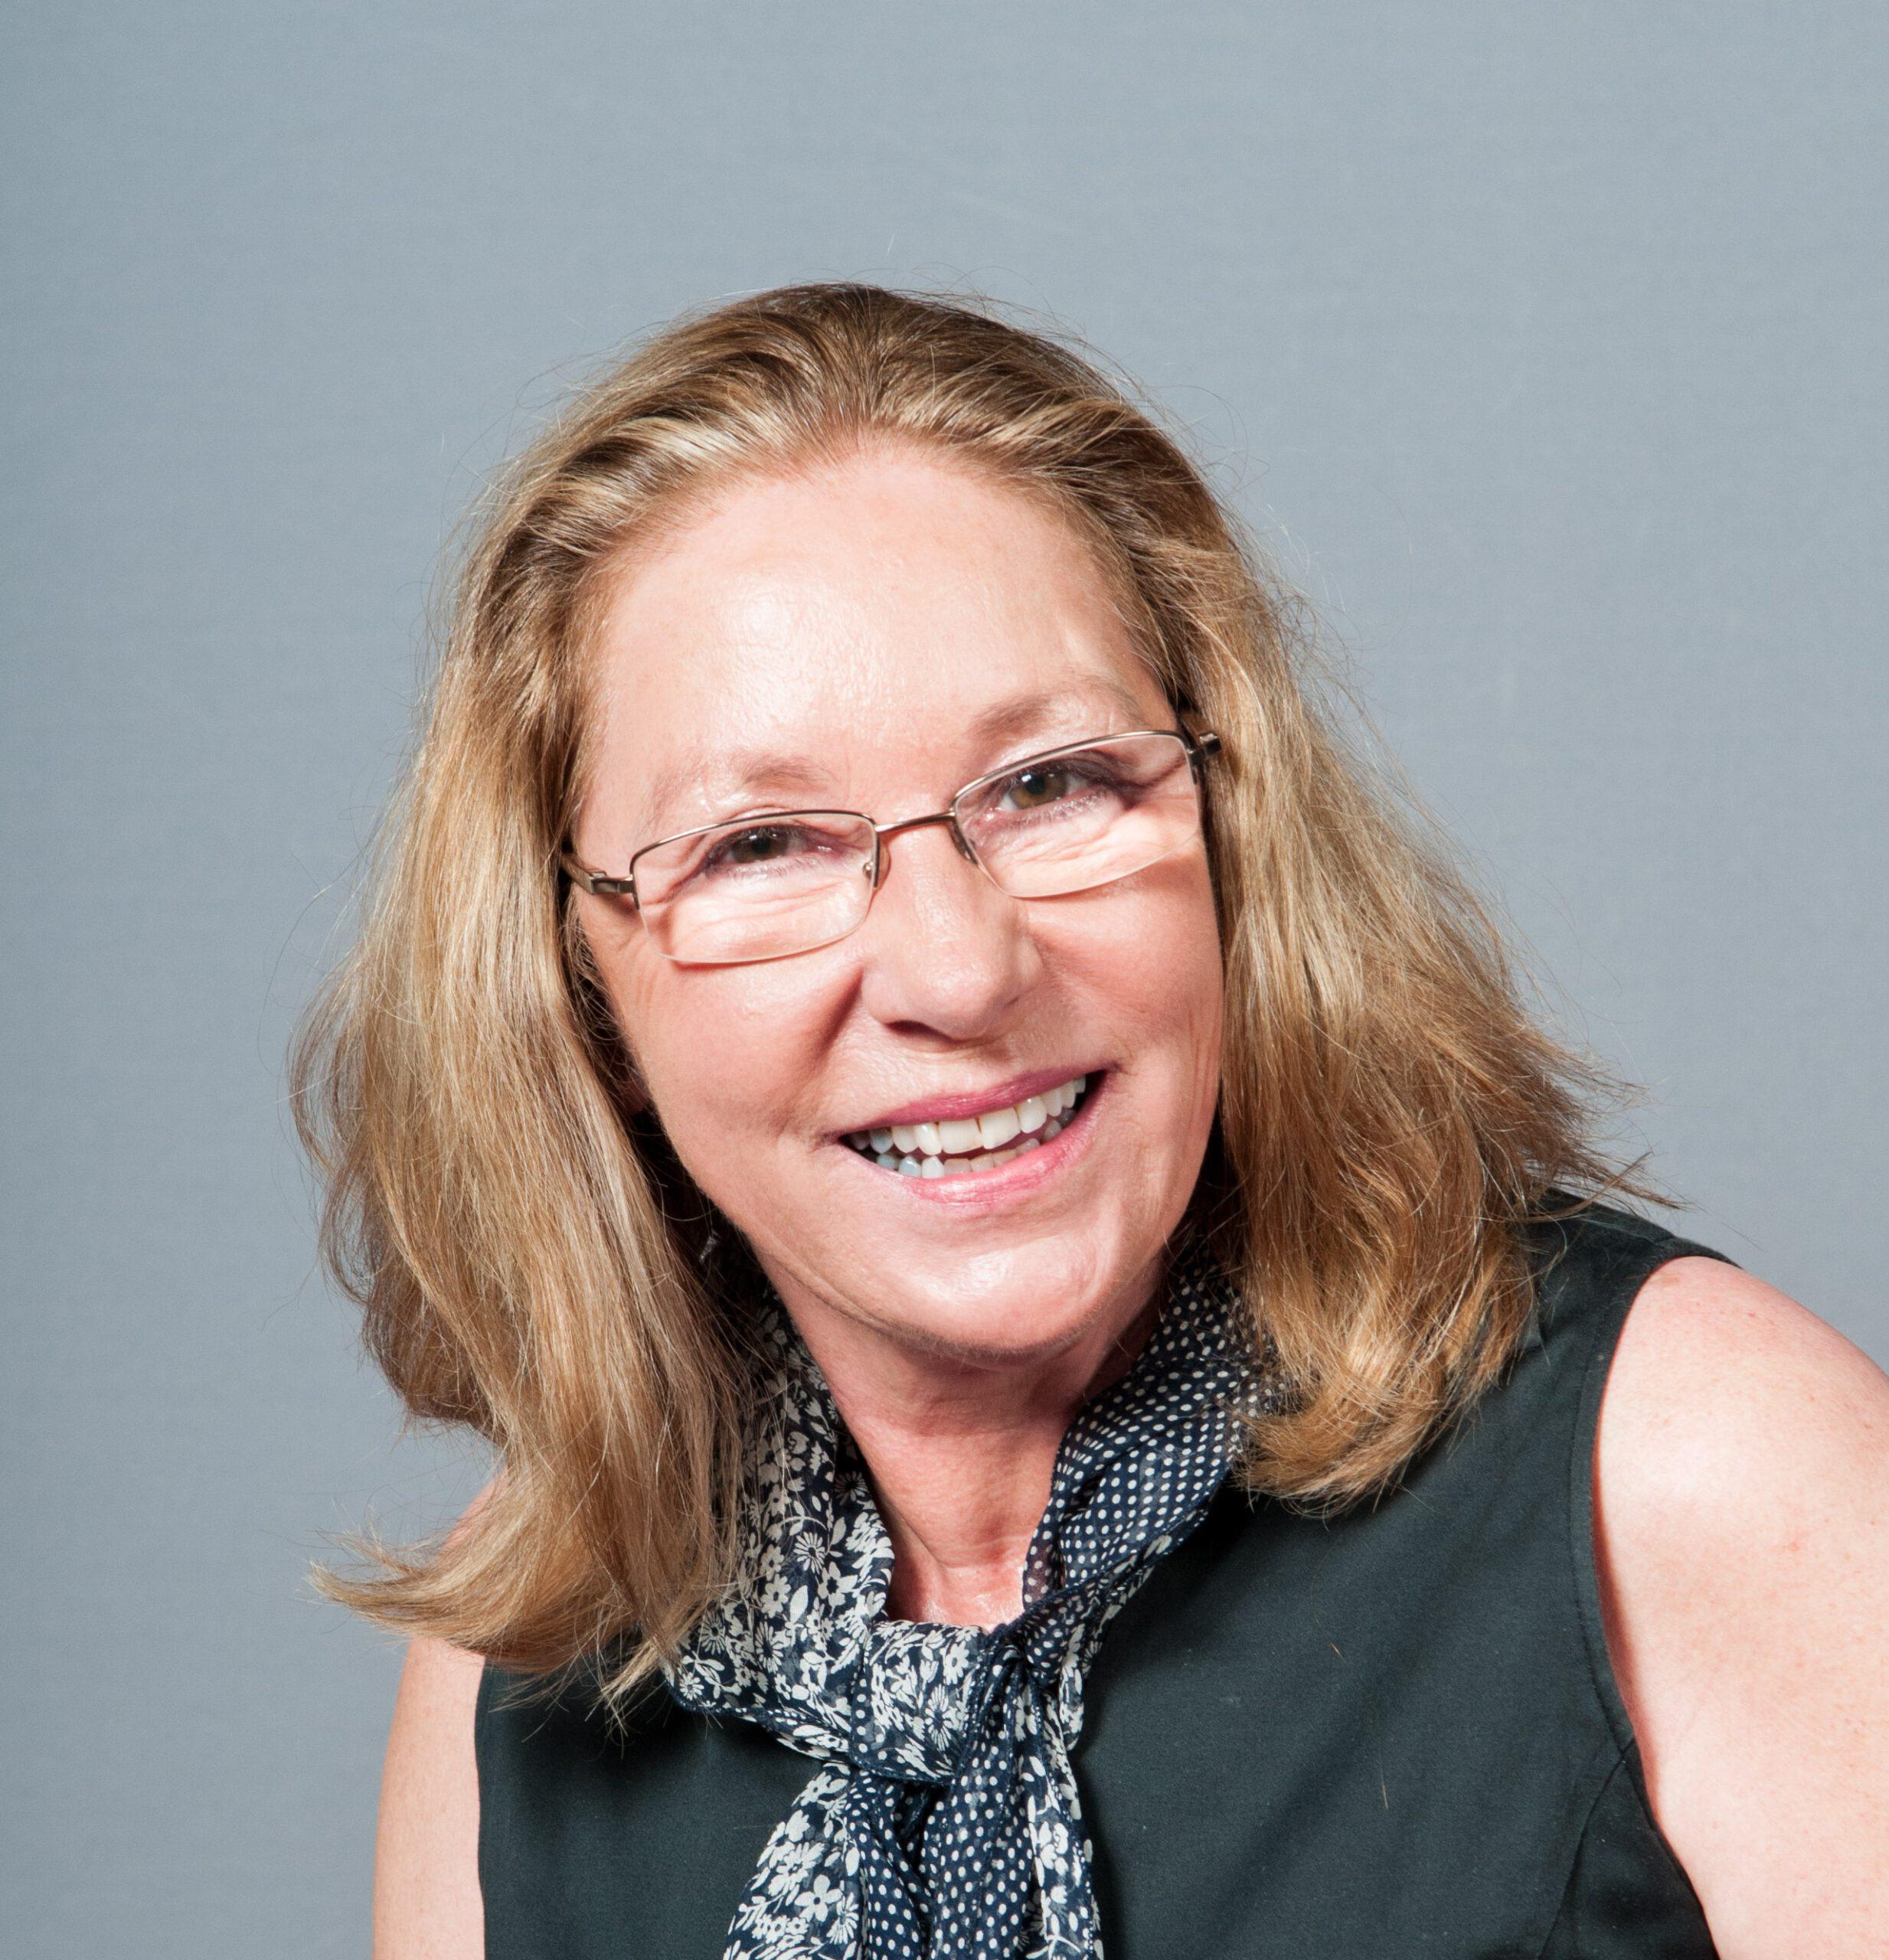 Marcia J. Scherer